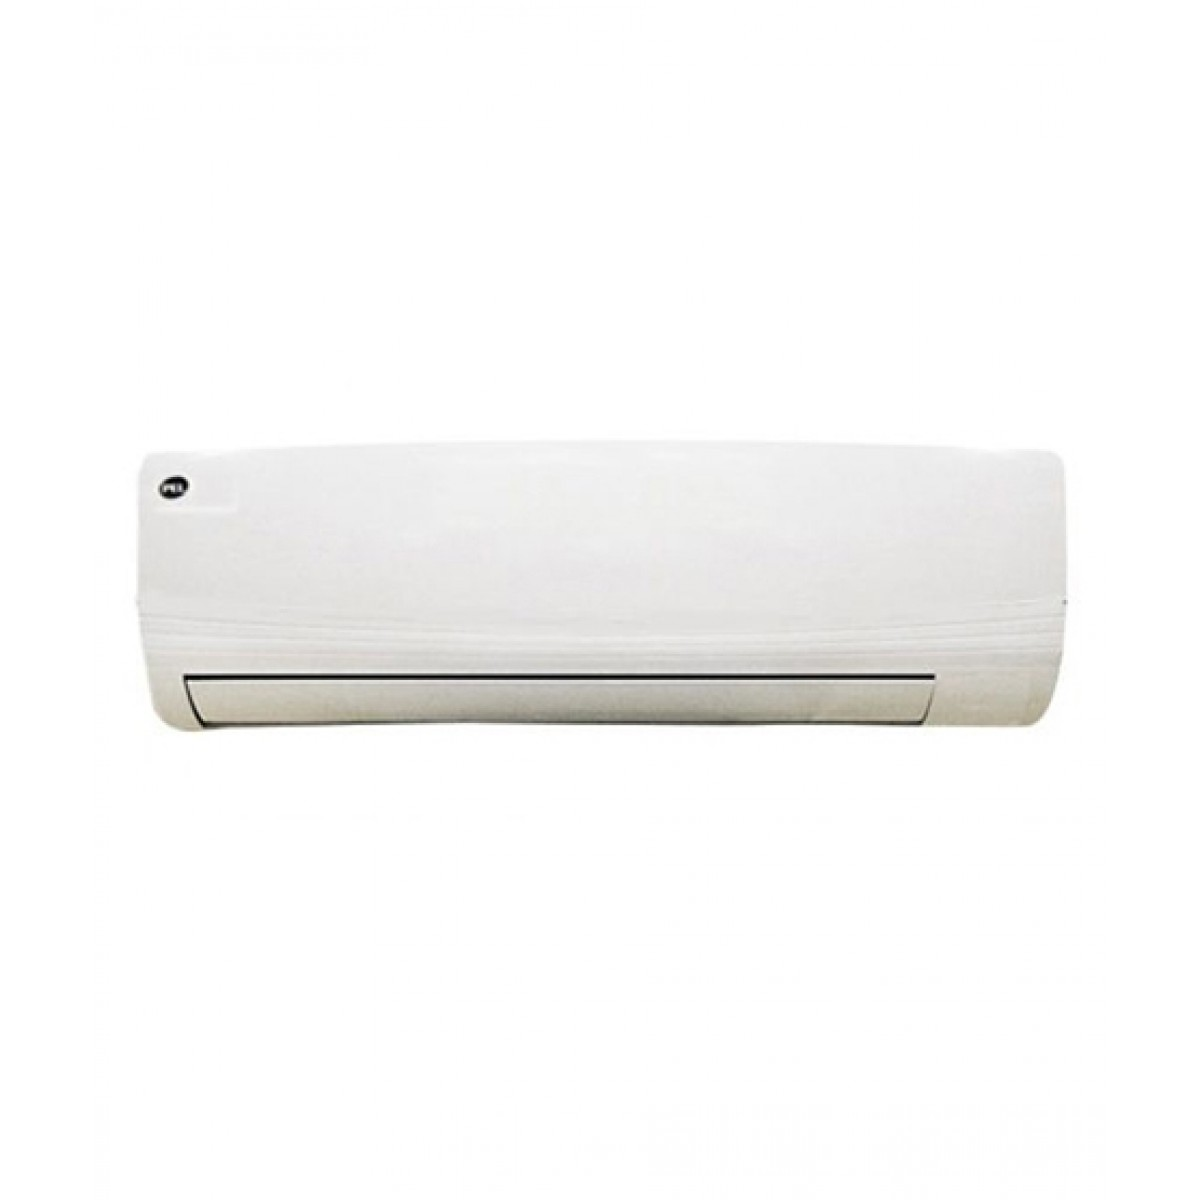 5ae8380a837 PEL DC Inverter Air Conditioner 1.5 Ton White (PINVL-18K)